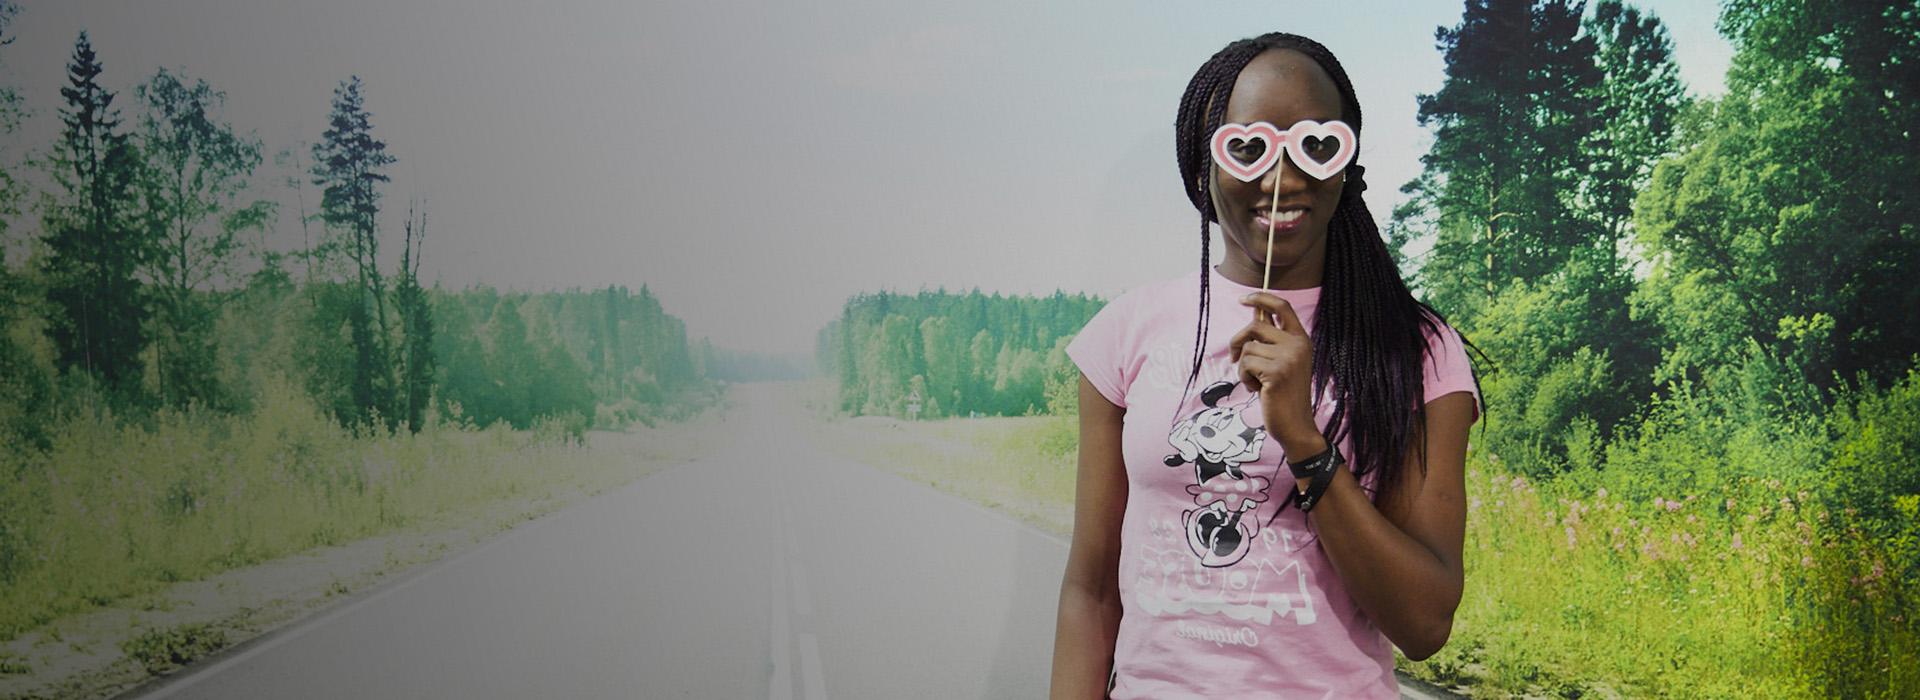 Lady pink tshirt road wall